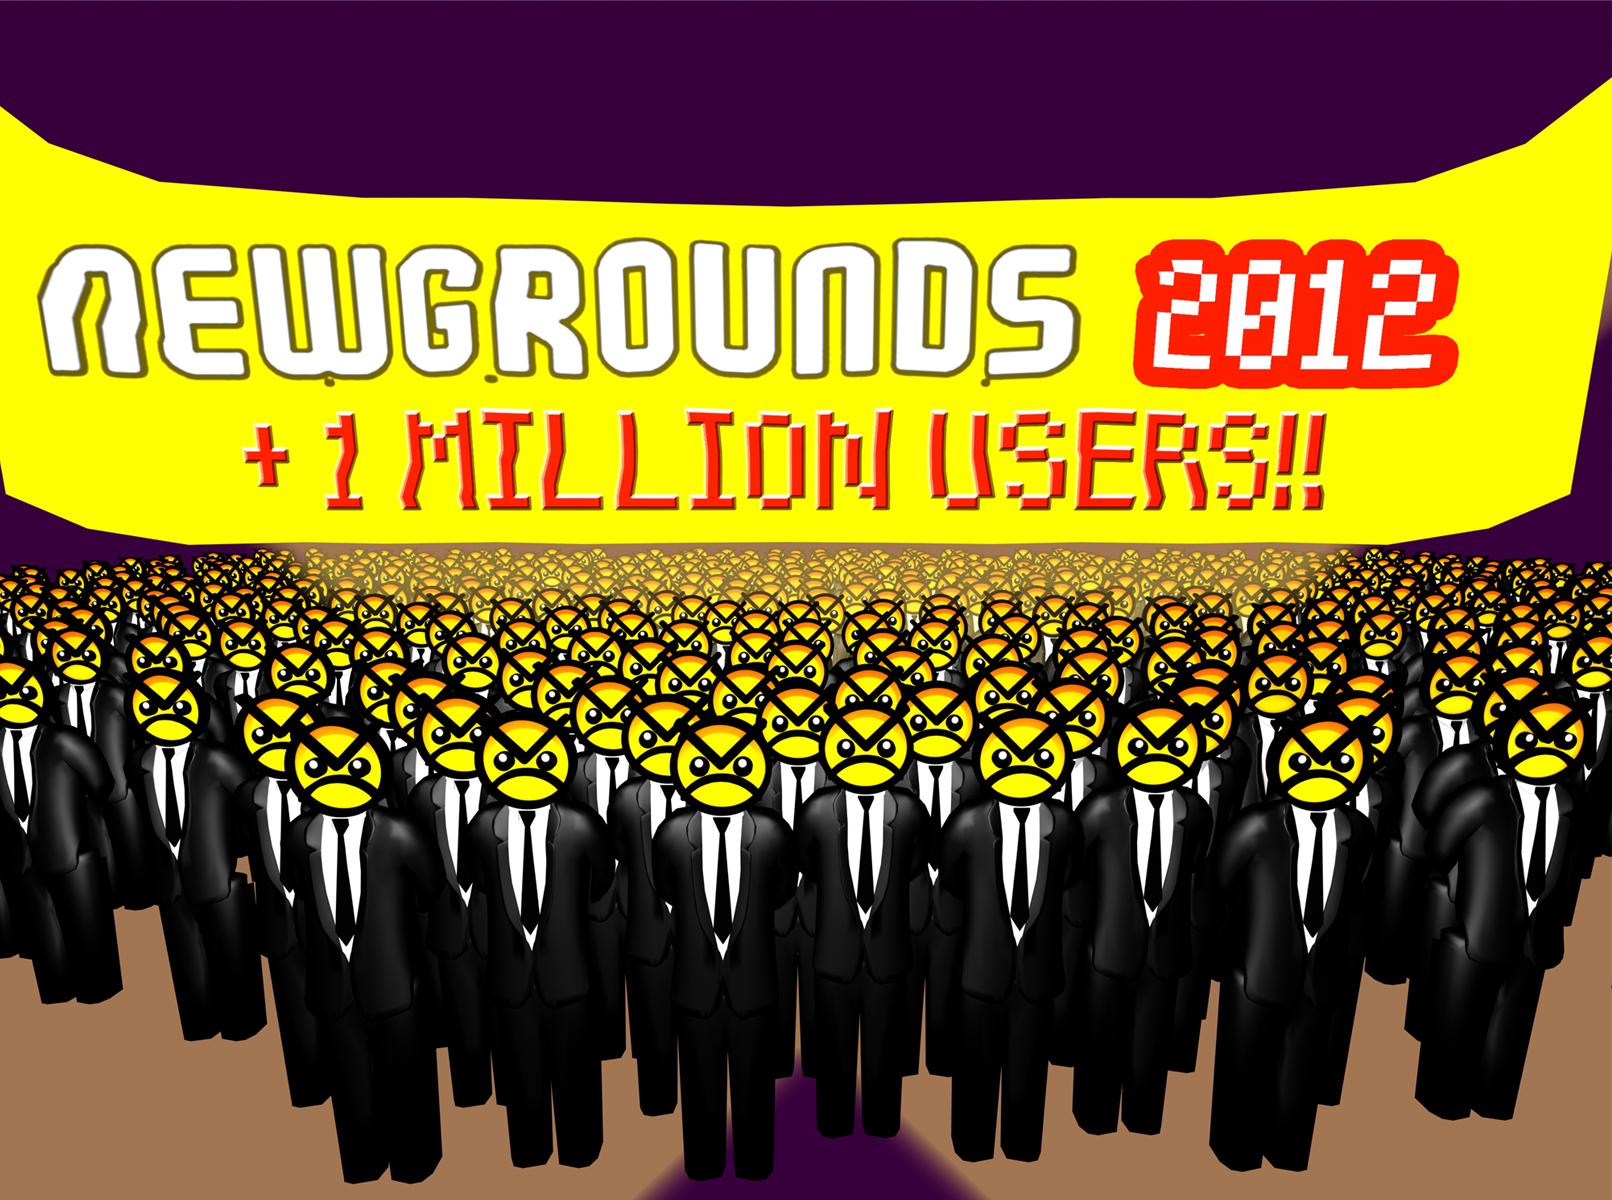 +1 Million Users!!